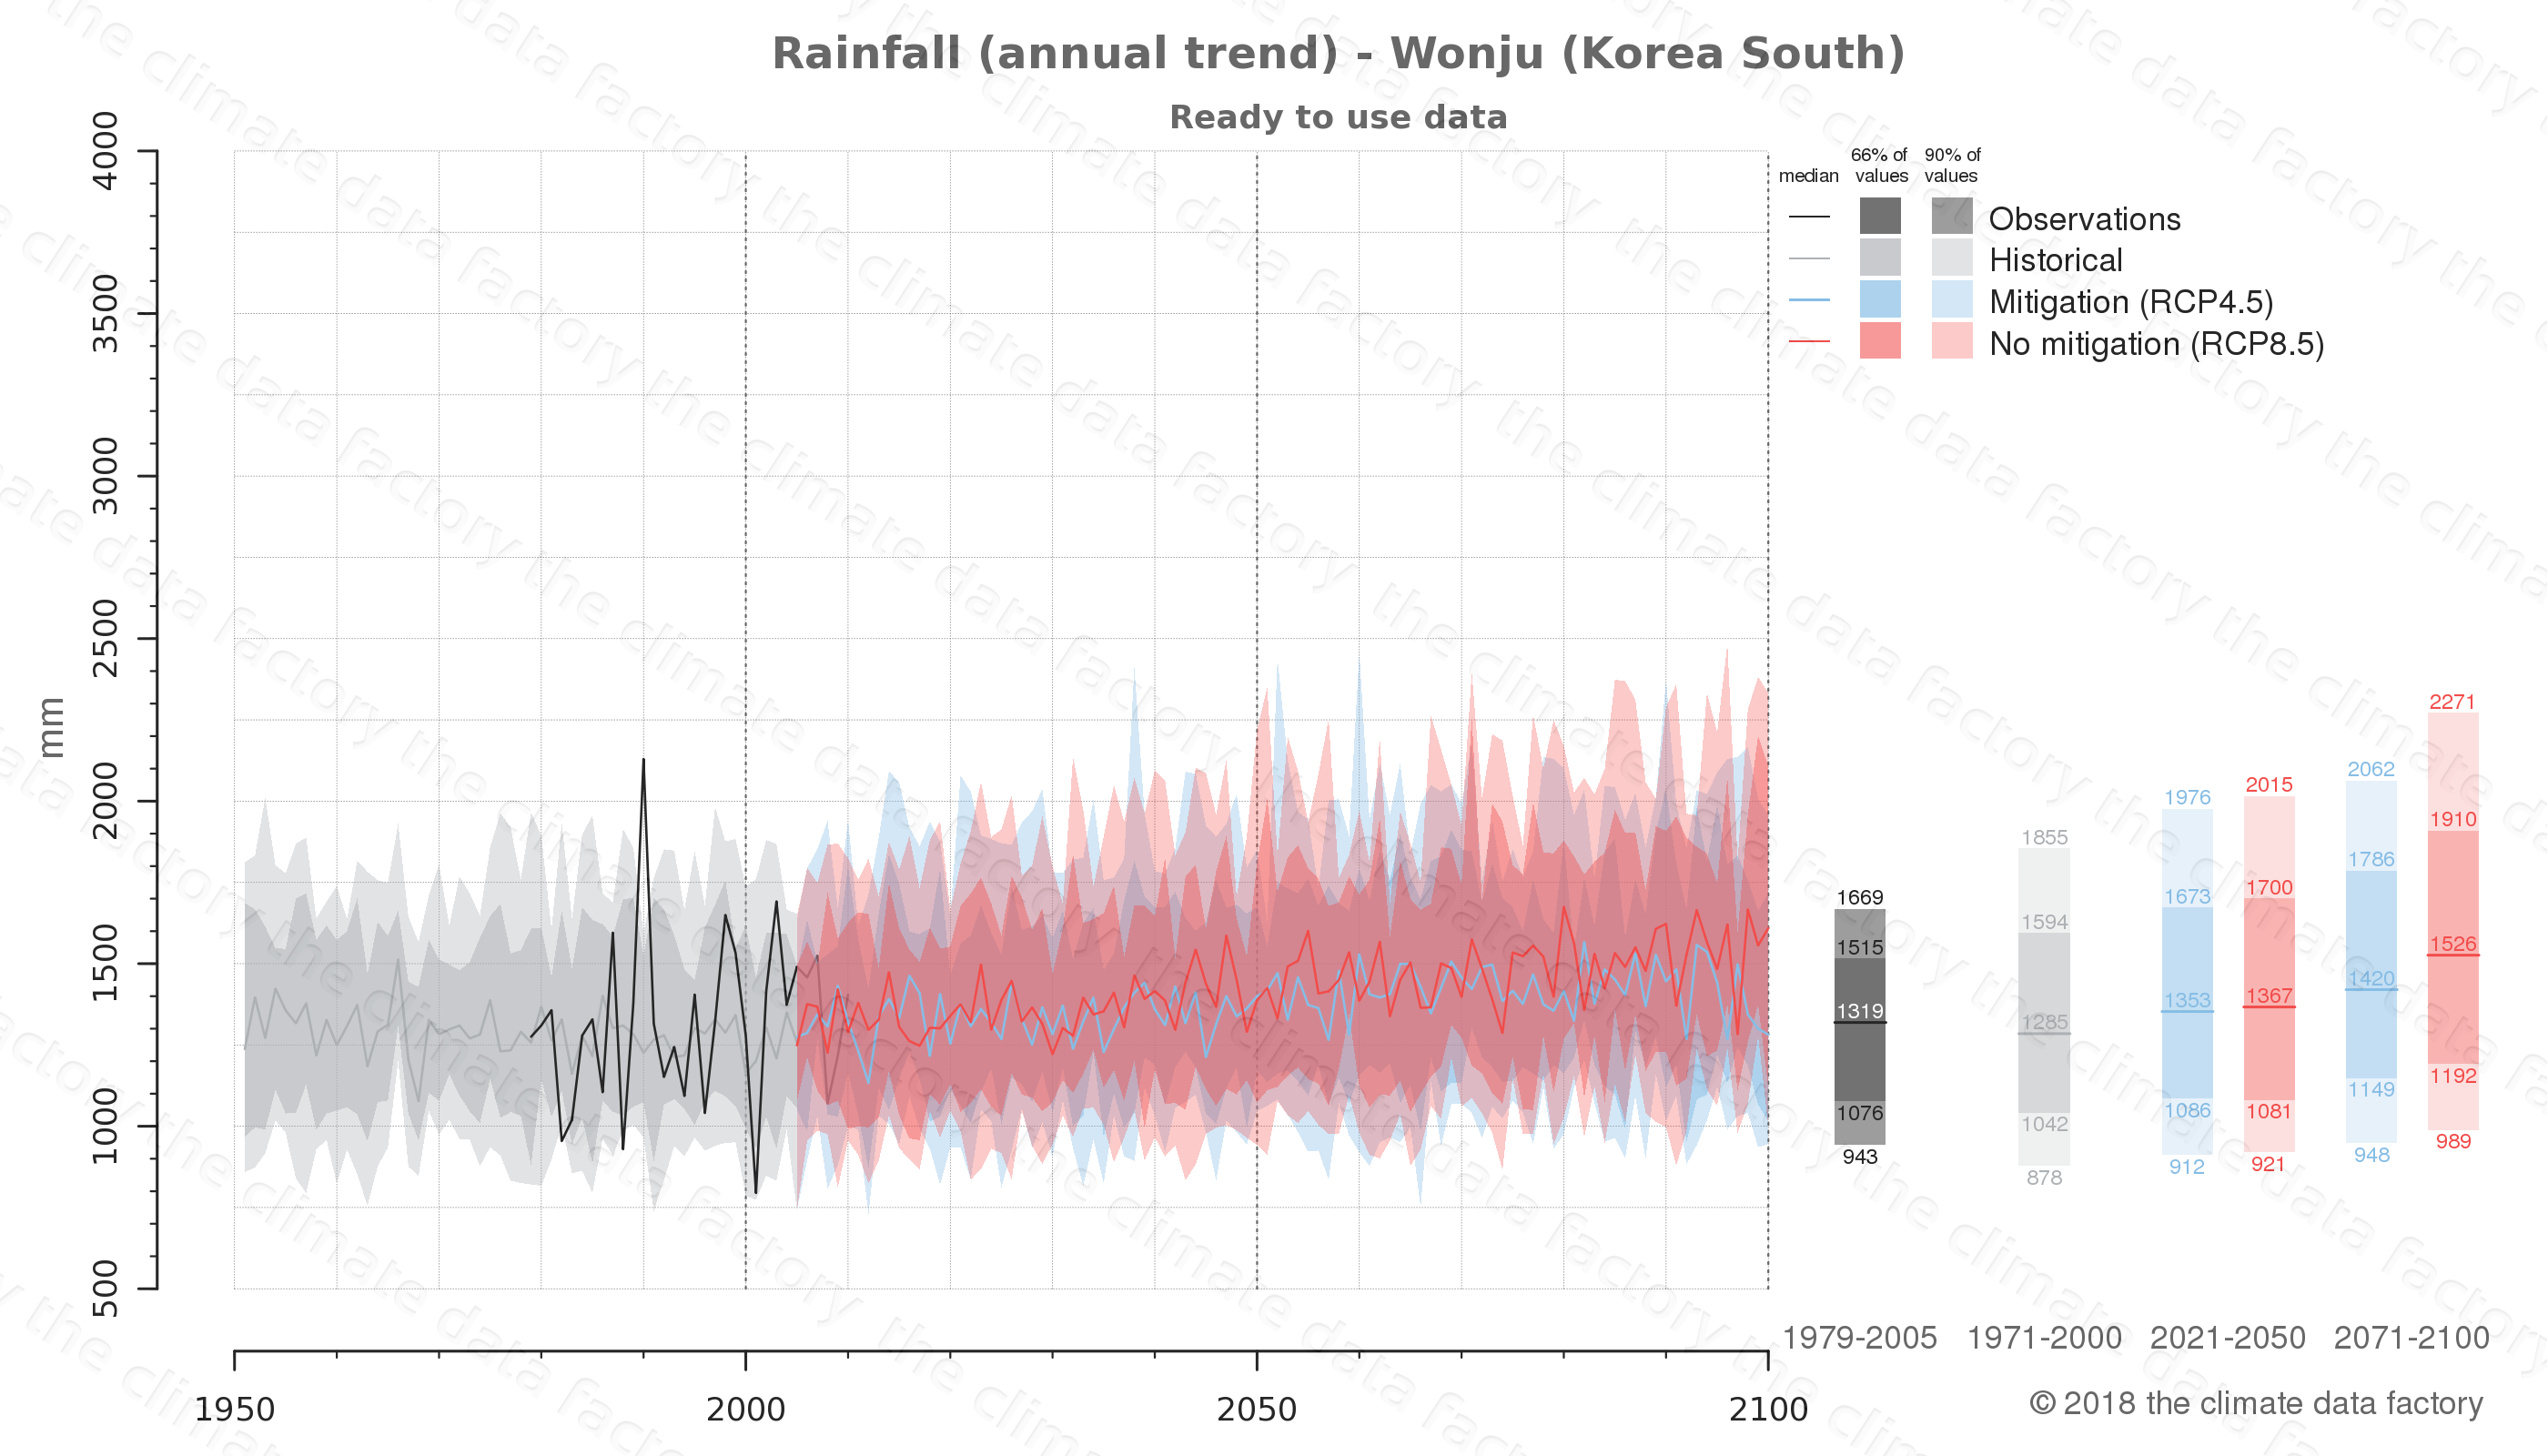 climate change data policy adaptation climate graph city data rainfall wonju south korea